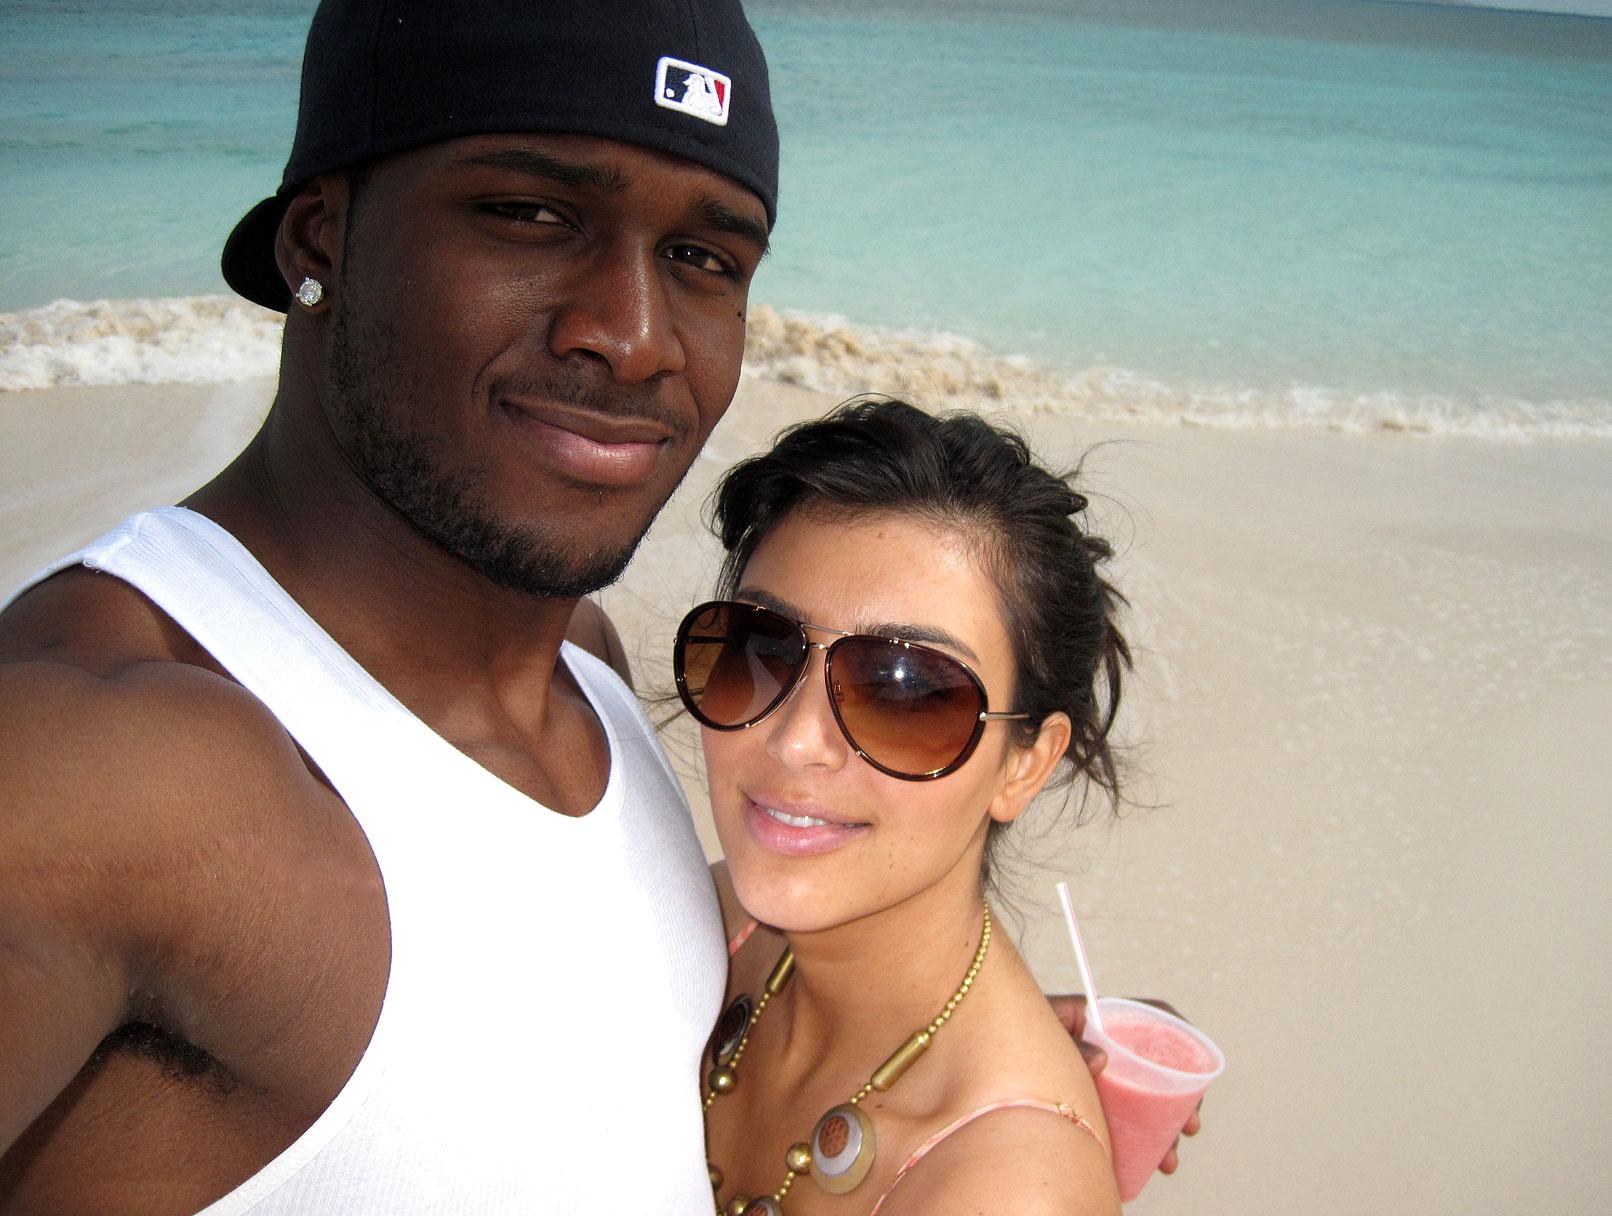 Kim Kardashian and Reggie Bush's Caribbean Getaway